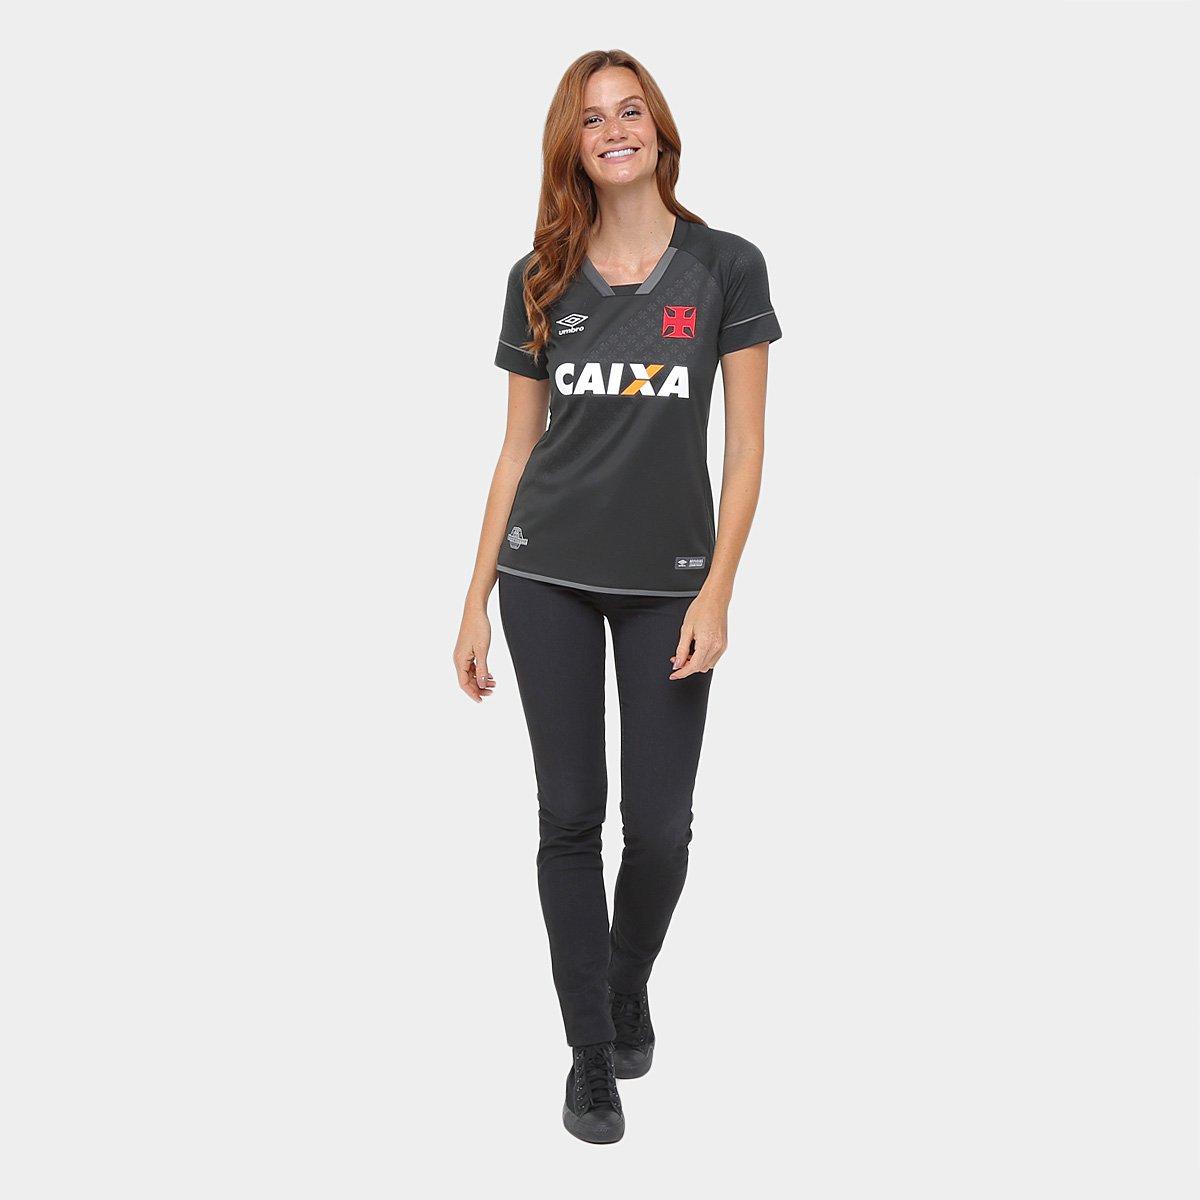 Camisa Vasco III 17 18 s n° - Torcedor Umbro Feminina - Compre Agora ... 242e5399519ea